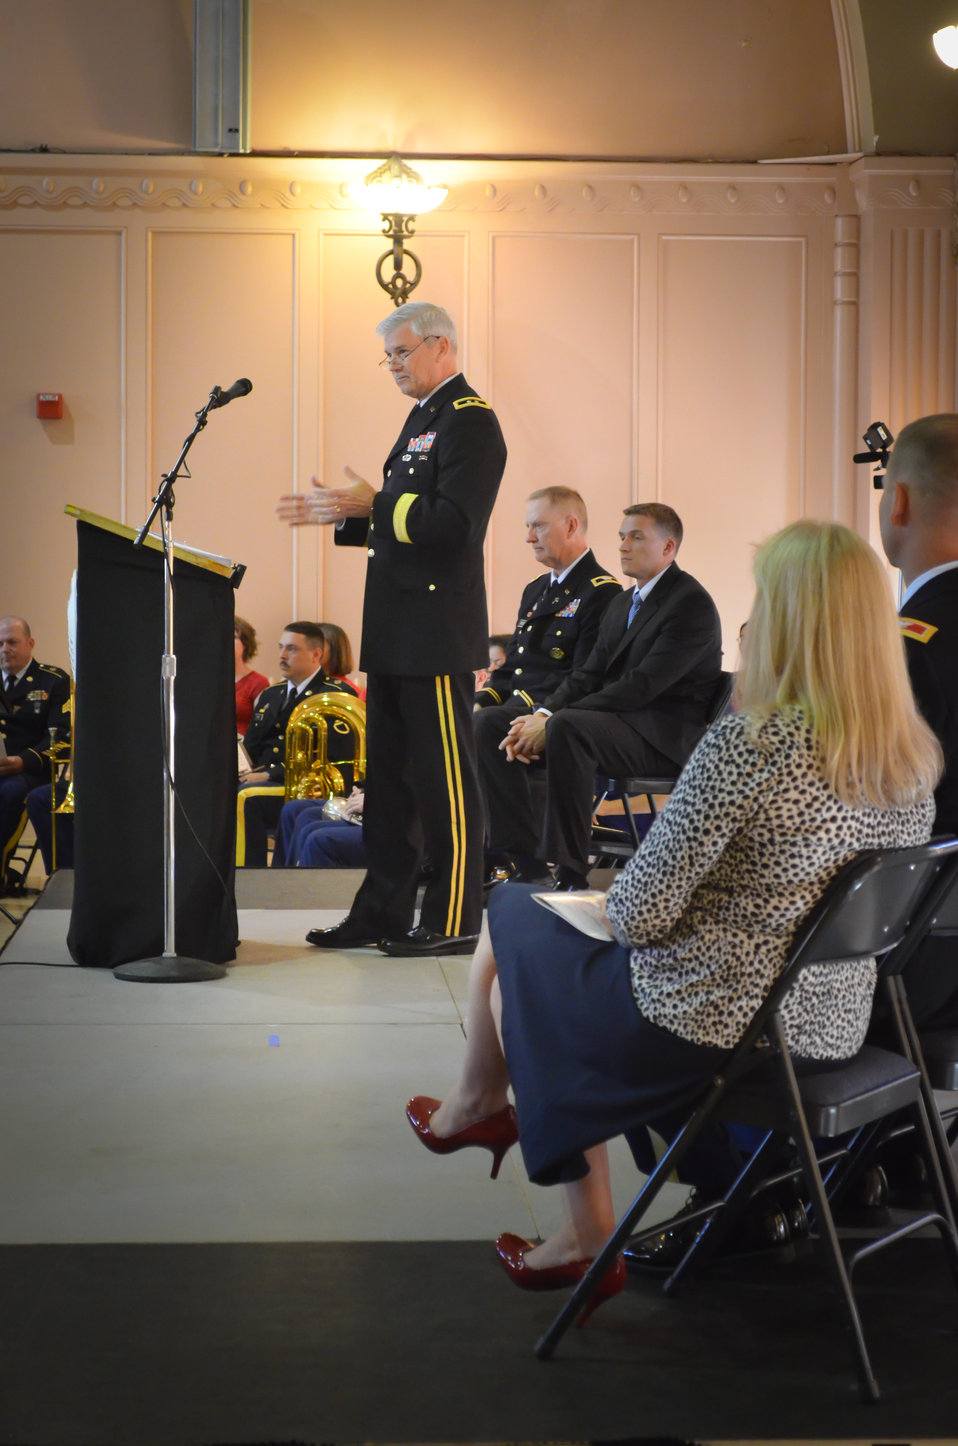 Major Gen. Walsh offers remarks